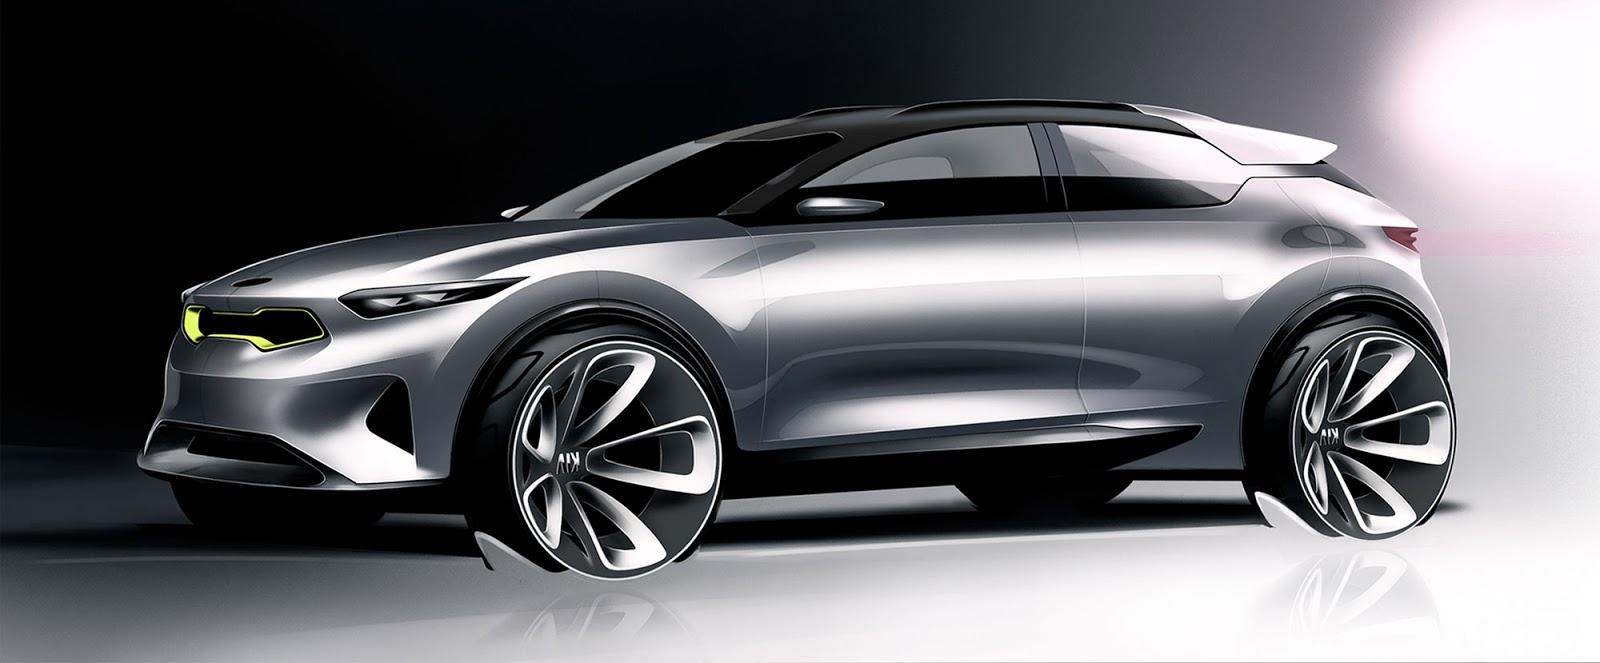 Kia Stonic sketch - option 1 styling side view